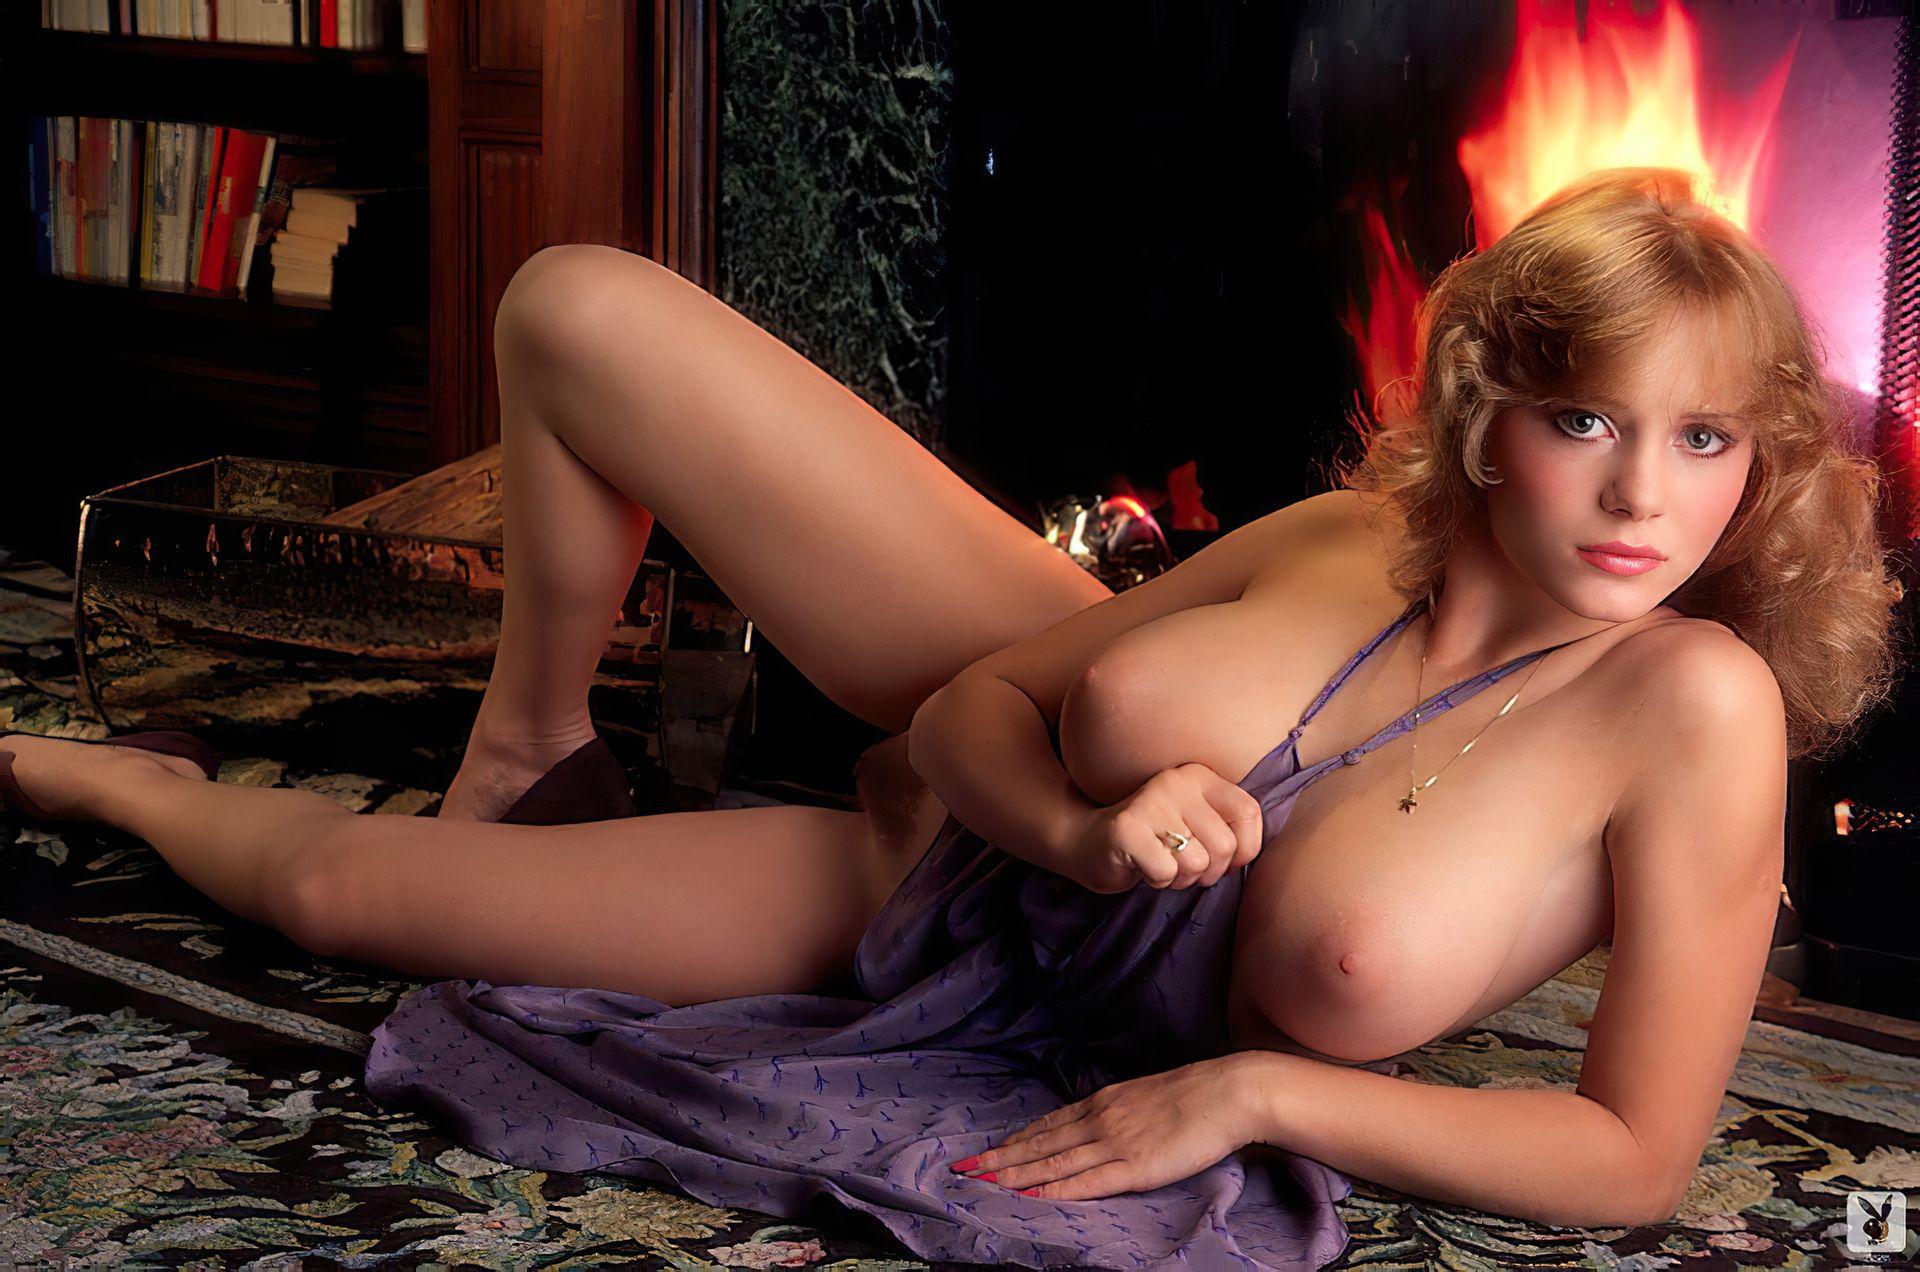 Macarthur kimberly naked